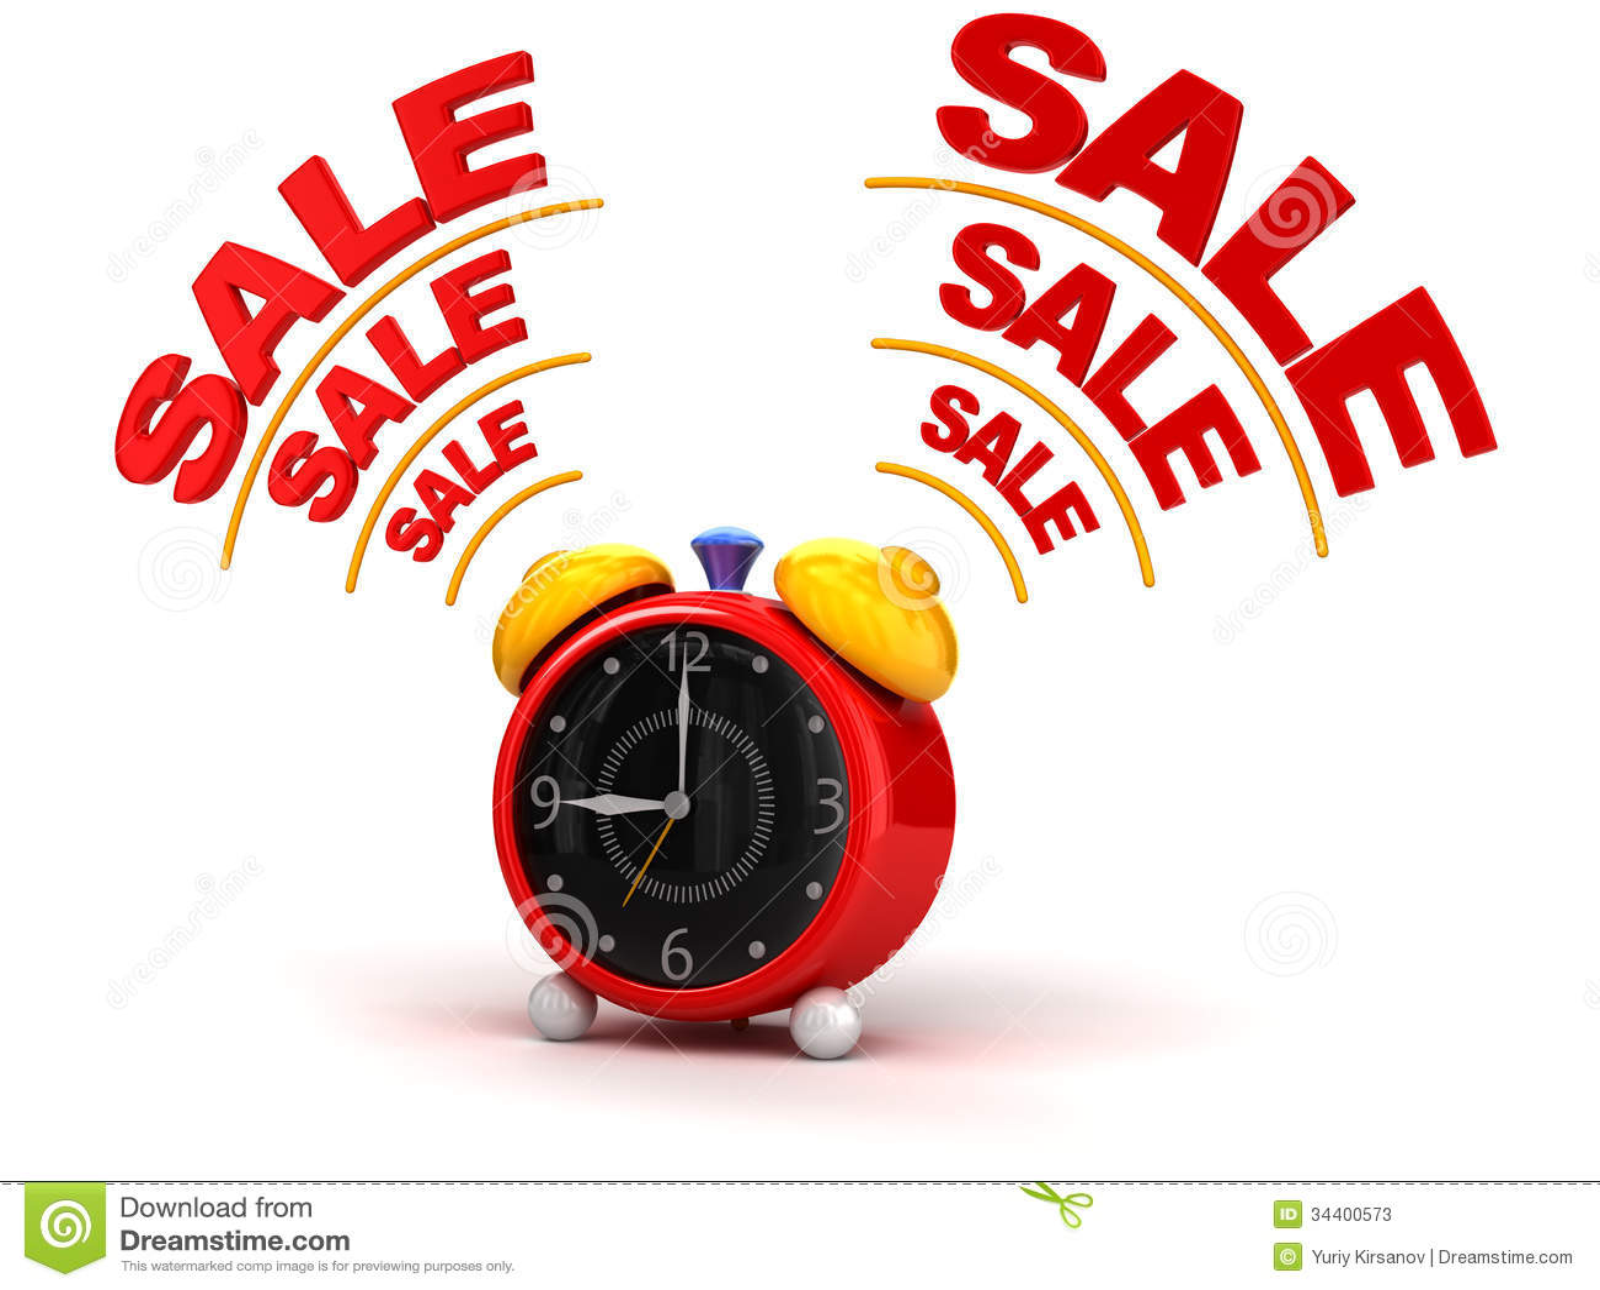 Sale Time On Alarm Clock Stock Photos Image 34400573